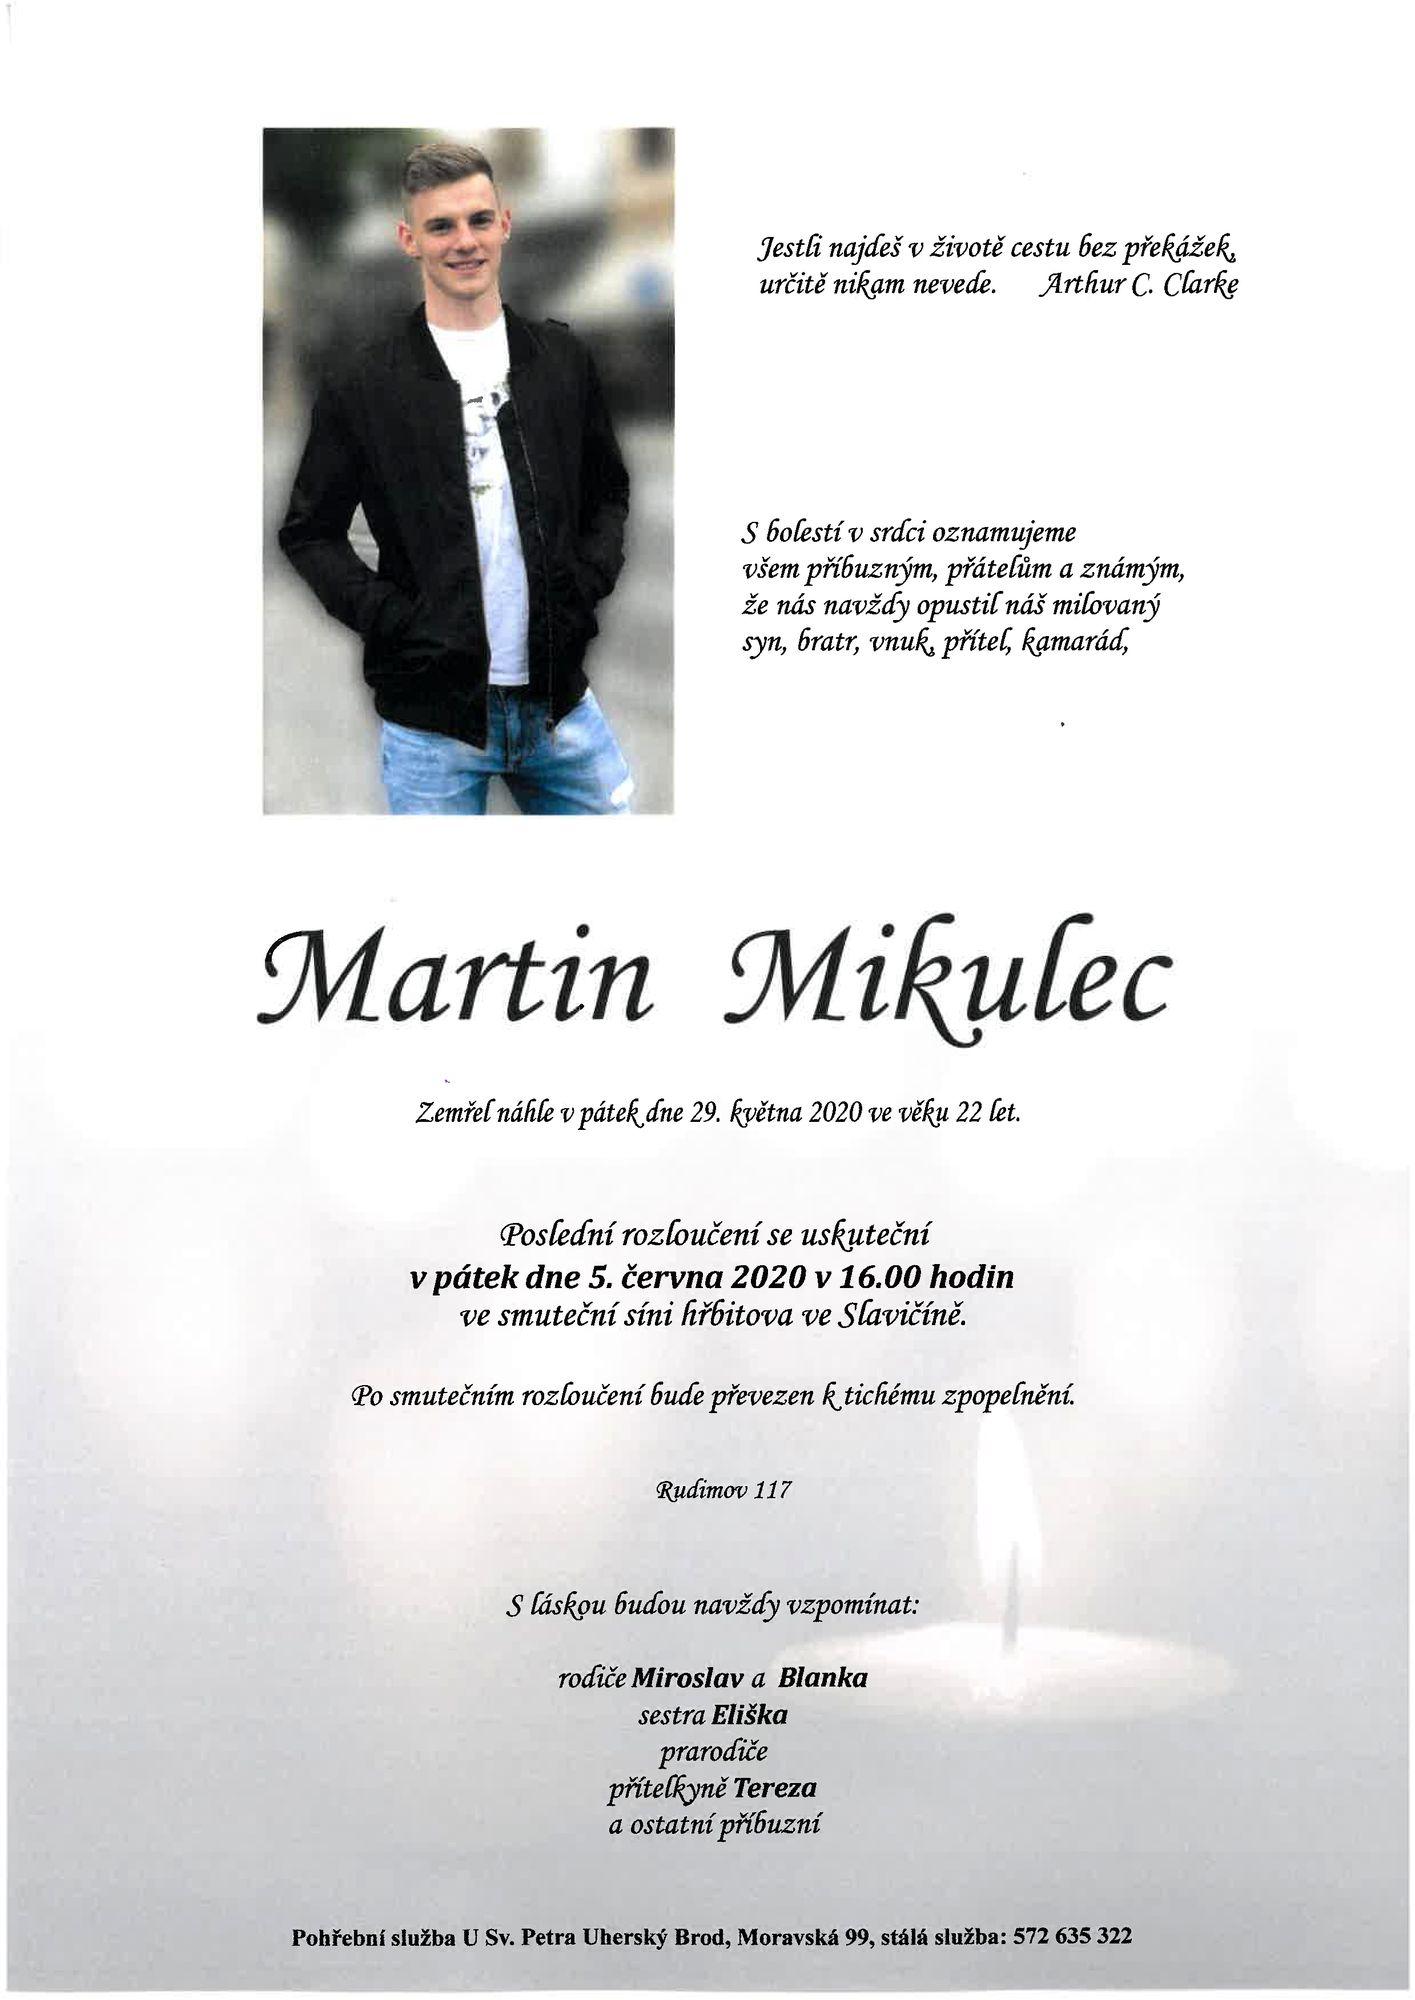 Martin Mikulec